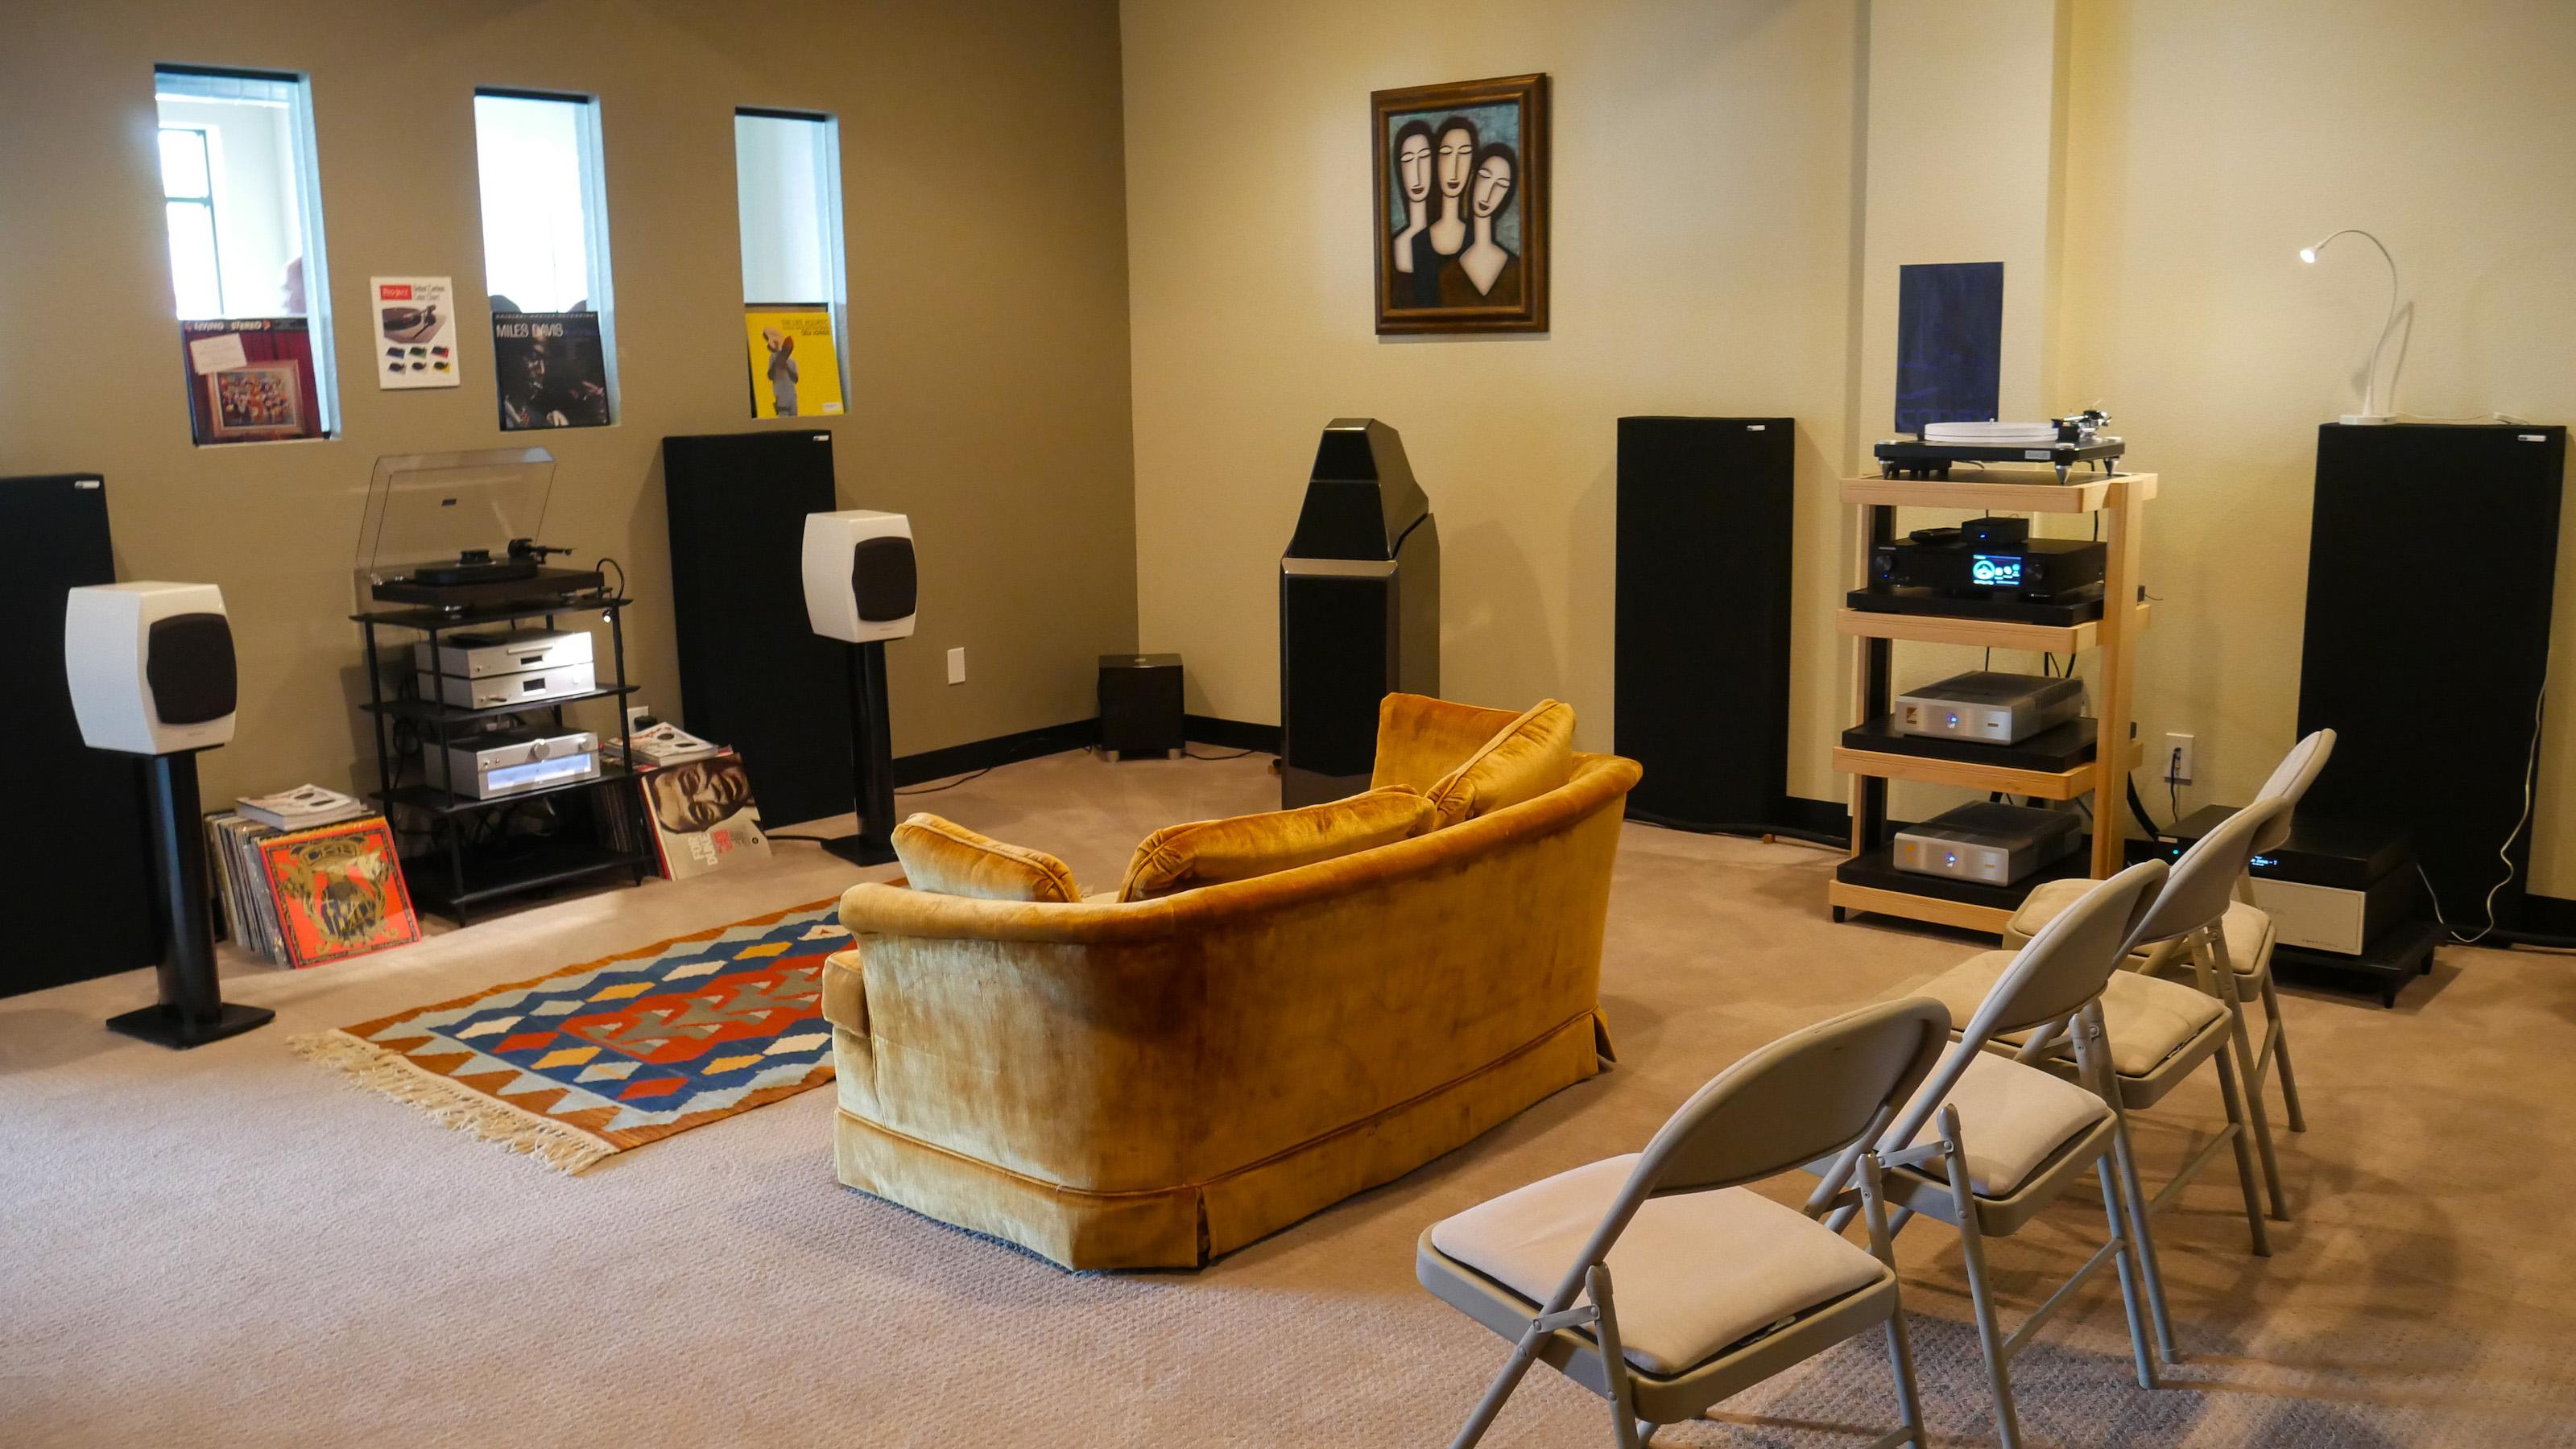 http://audiophilereview.com/images/Tec5.jpg